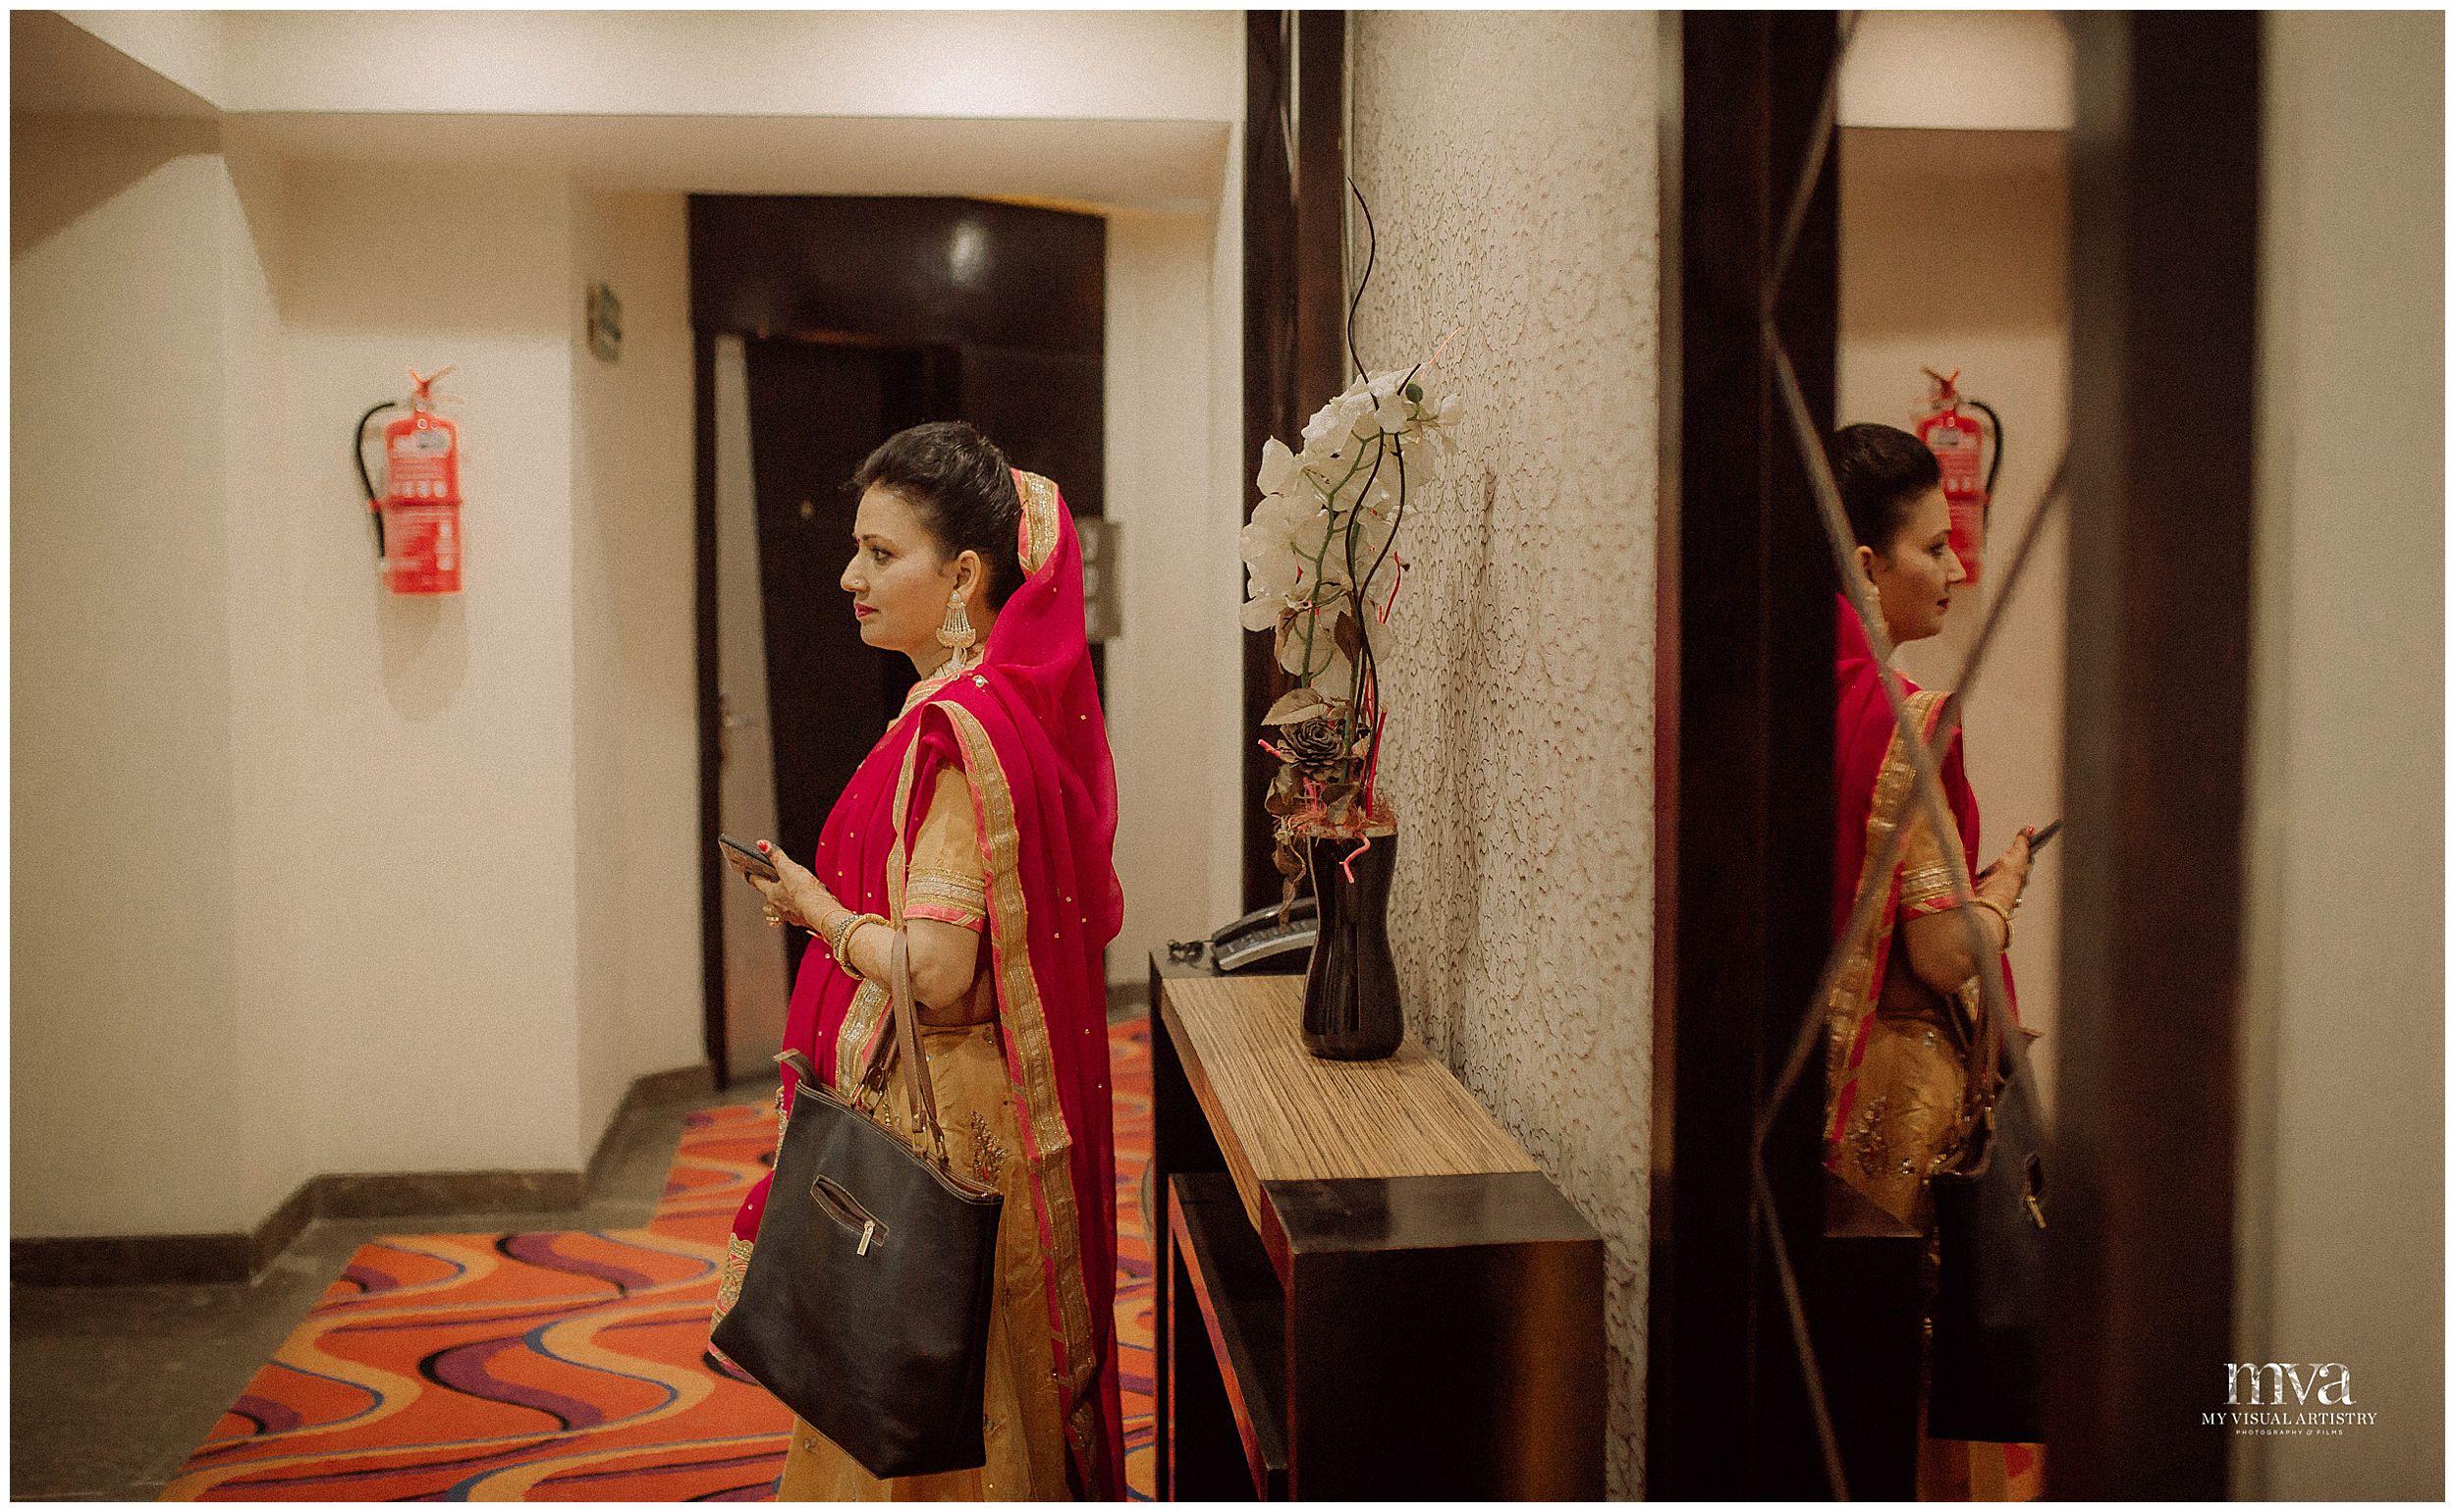 SONAAL_AMI_MYVISUALARTISTRY_WEDDING_PHOTOGRAPHY_MVA_NEPAL_KATHMANDU_SOALTEE31.jpg